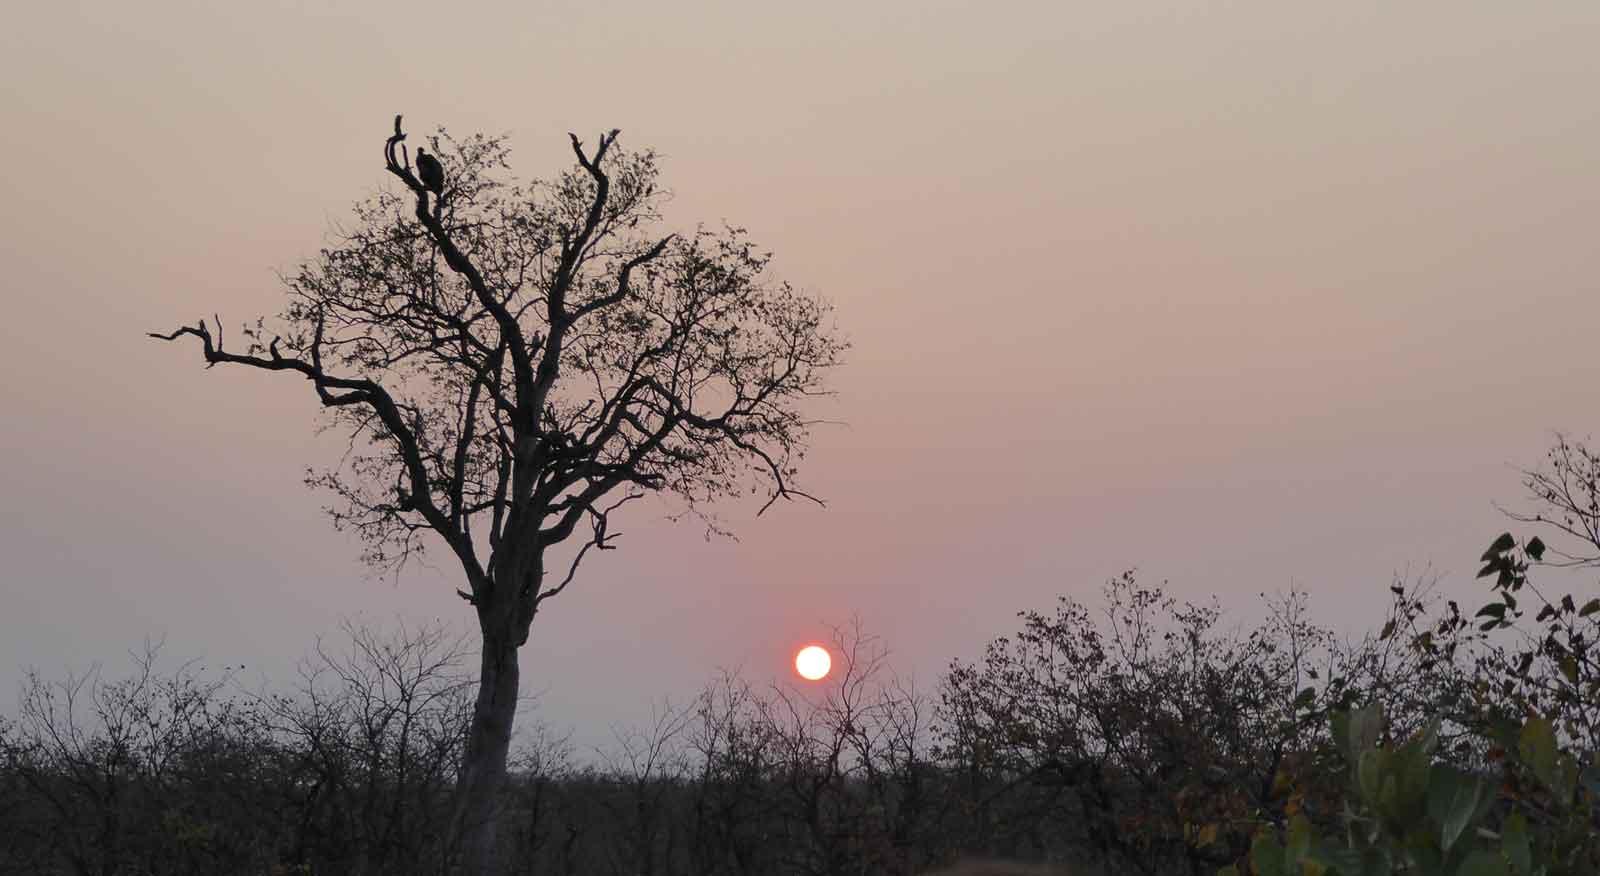 #GuestSafariReview : Nsala Safari Camp a Firm Favourite